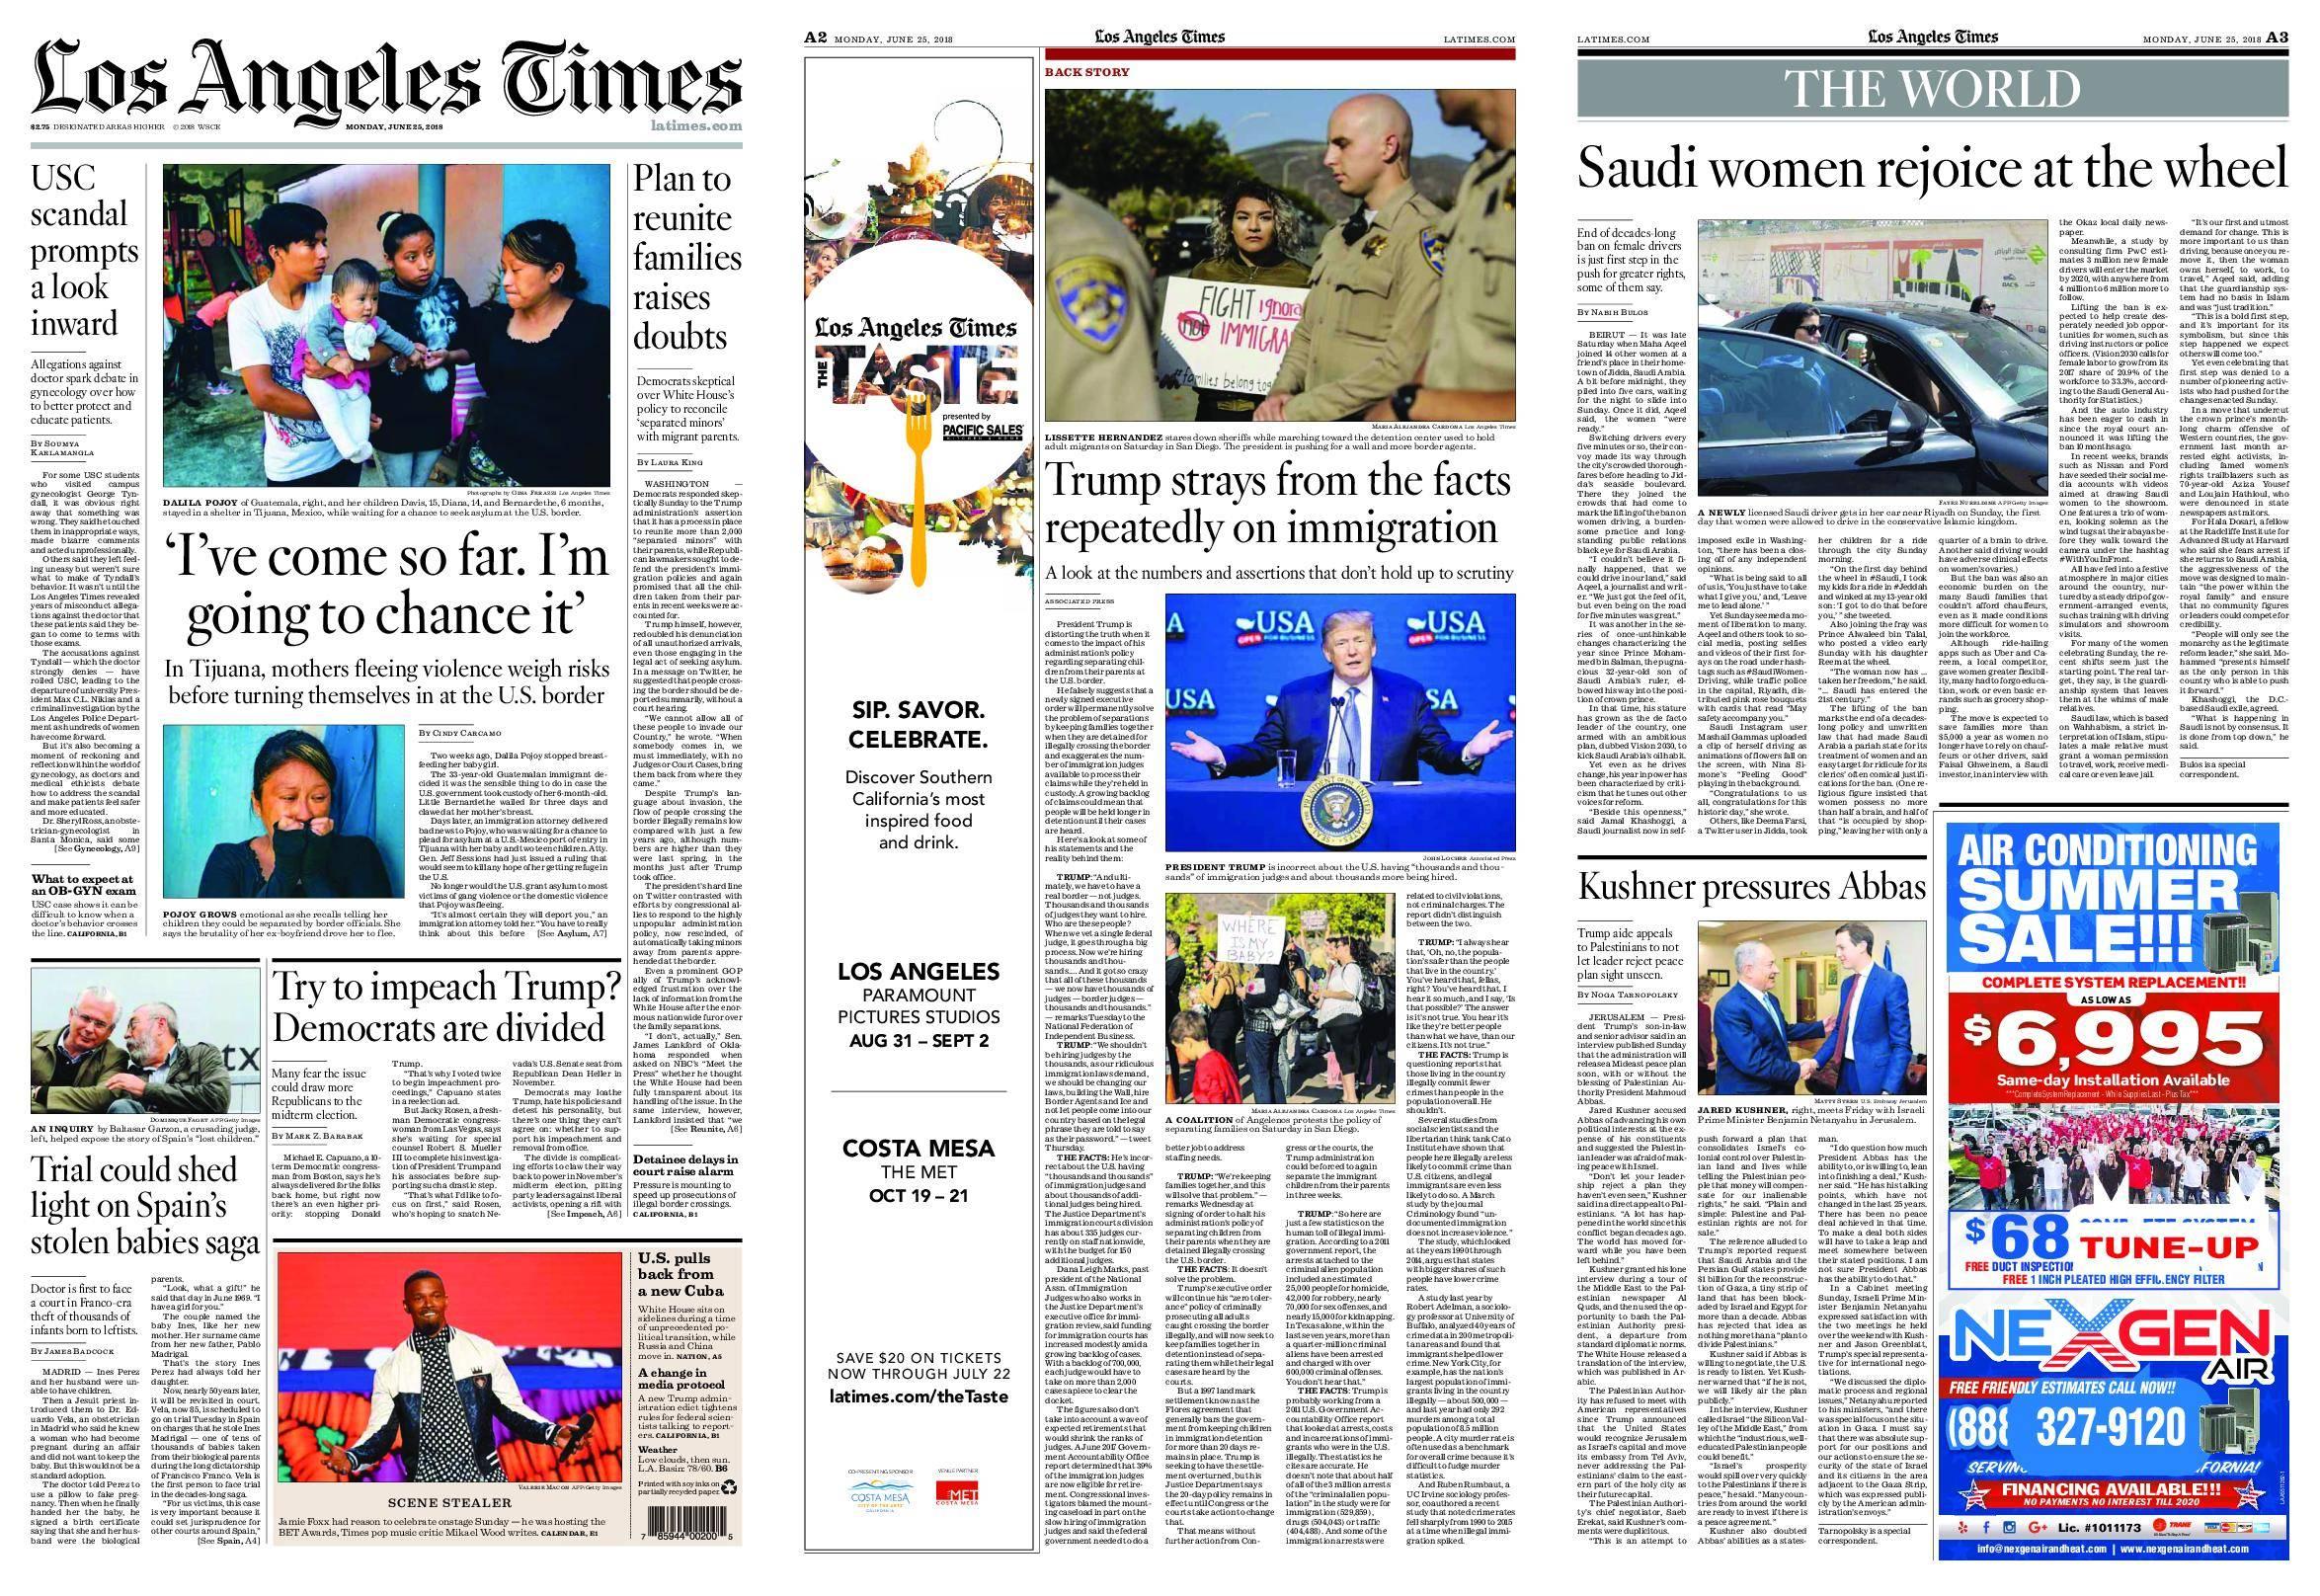 Los Angeles Times – June 25, 2018 / AvaxHome